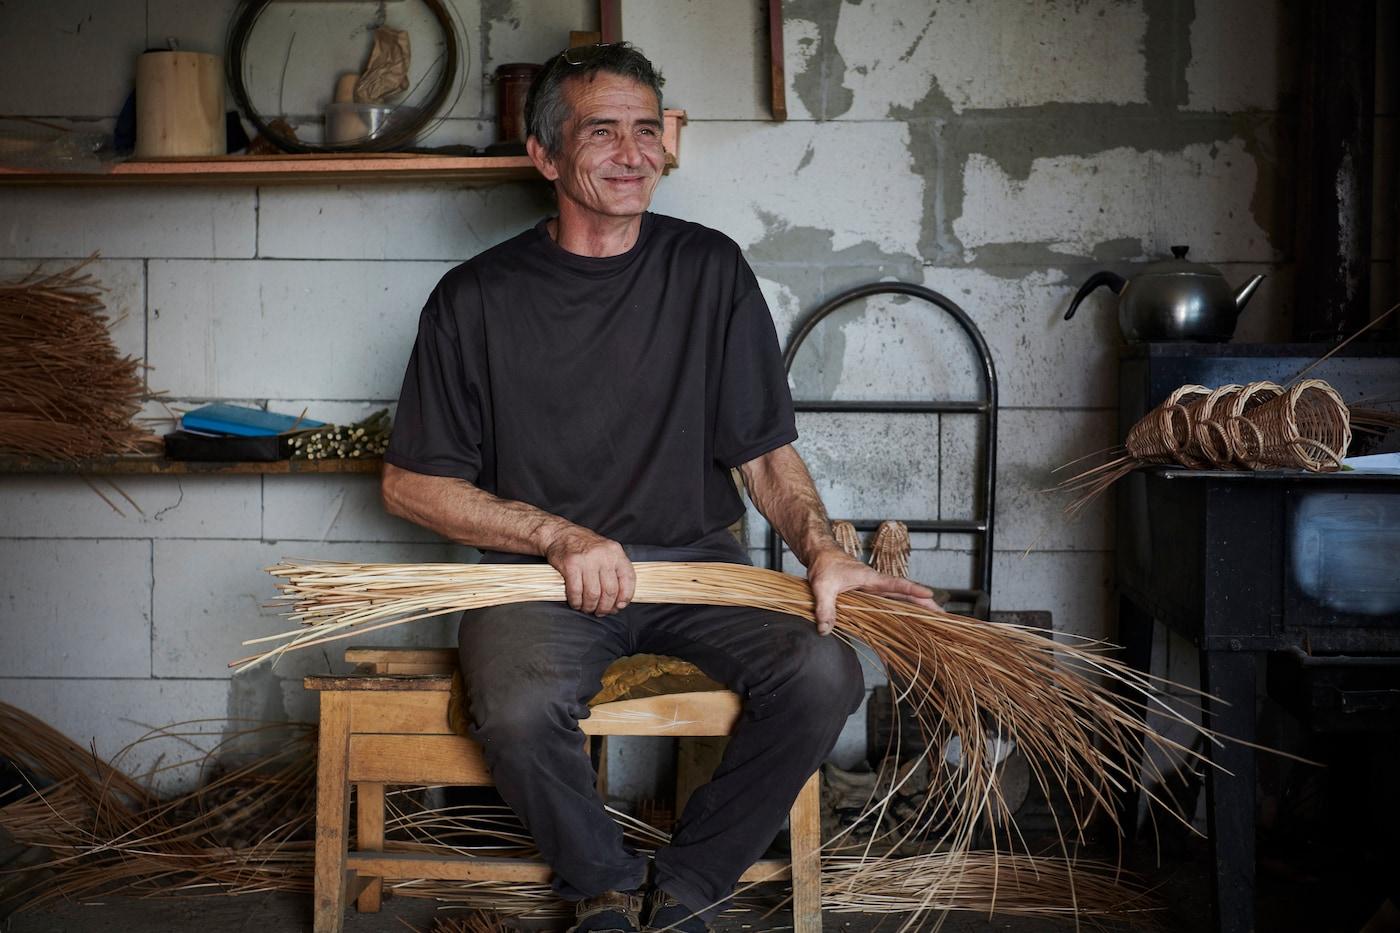 Hombre sentado con polera gris oscura, sosteniendo un material de fibra natural para armar un mueble.